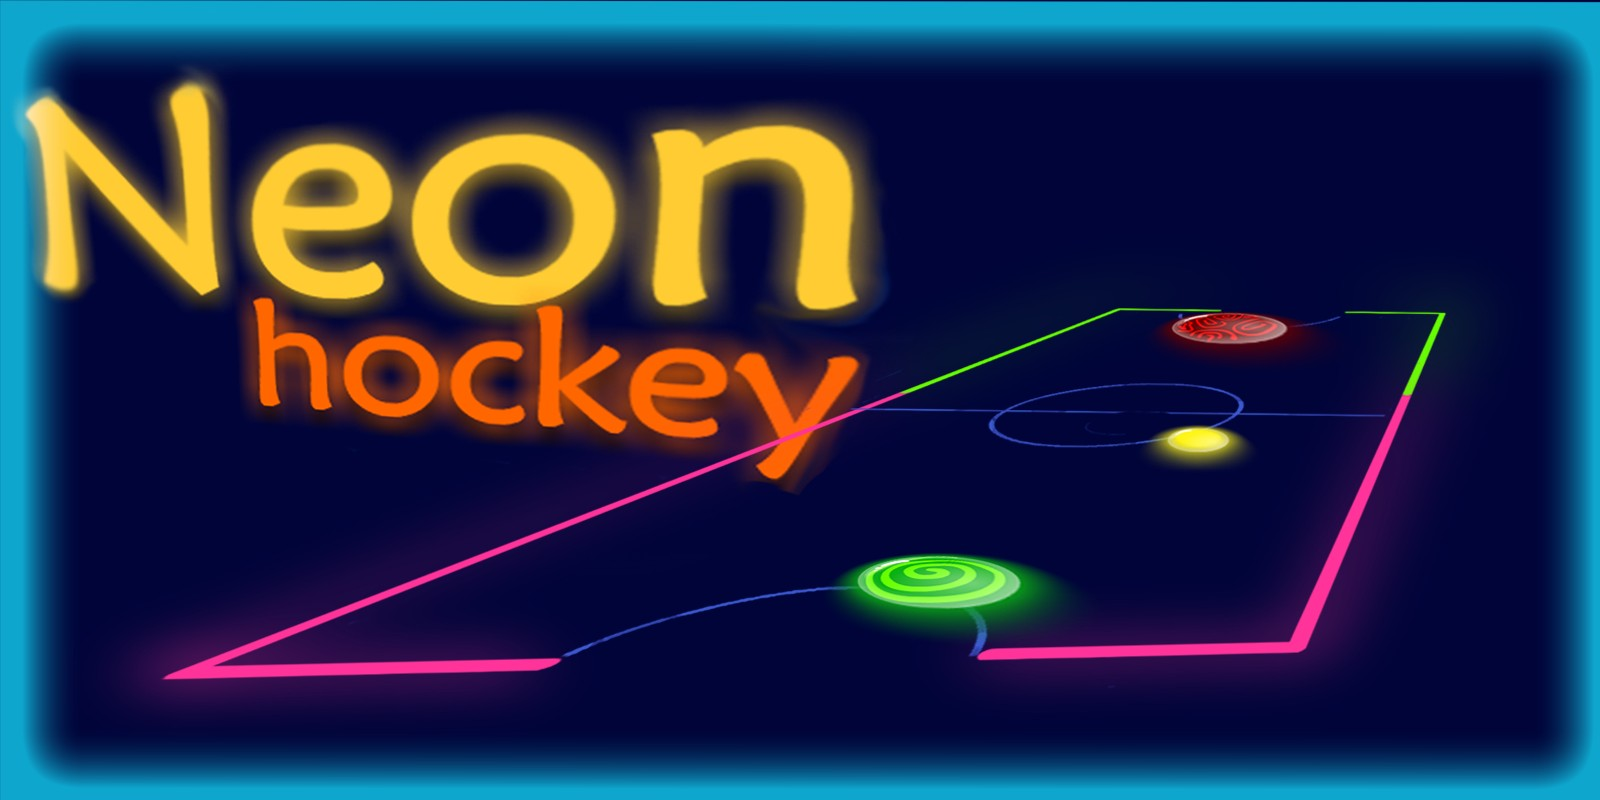 Neon Air Hockey - Unity Project